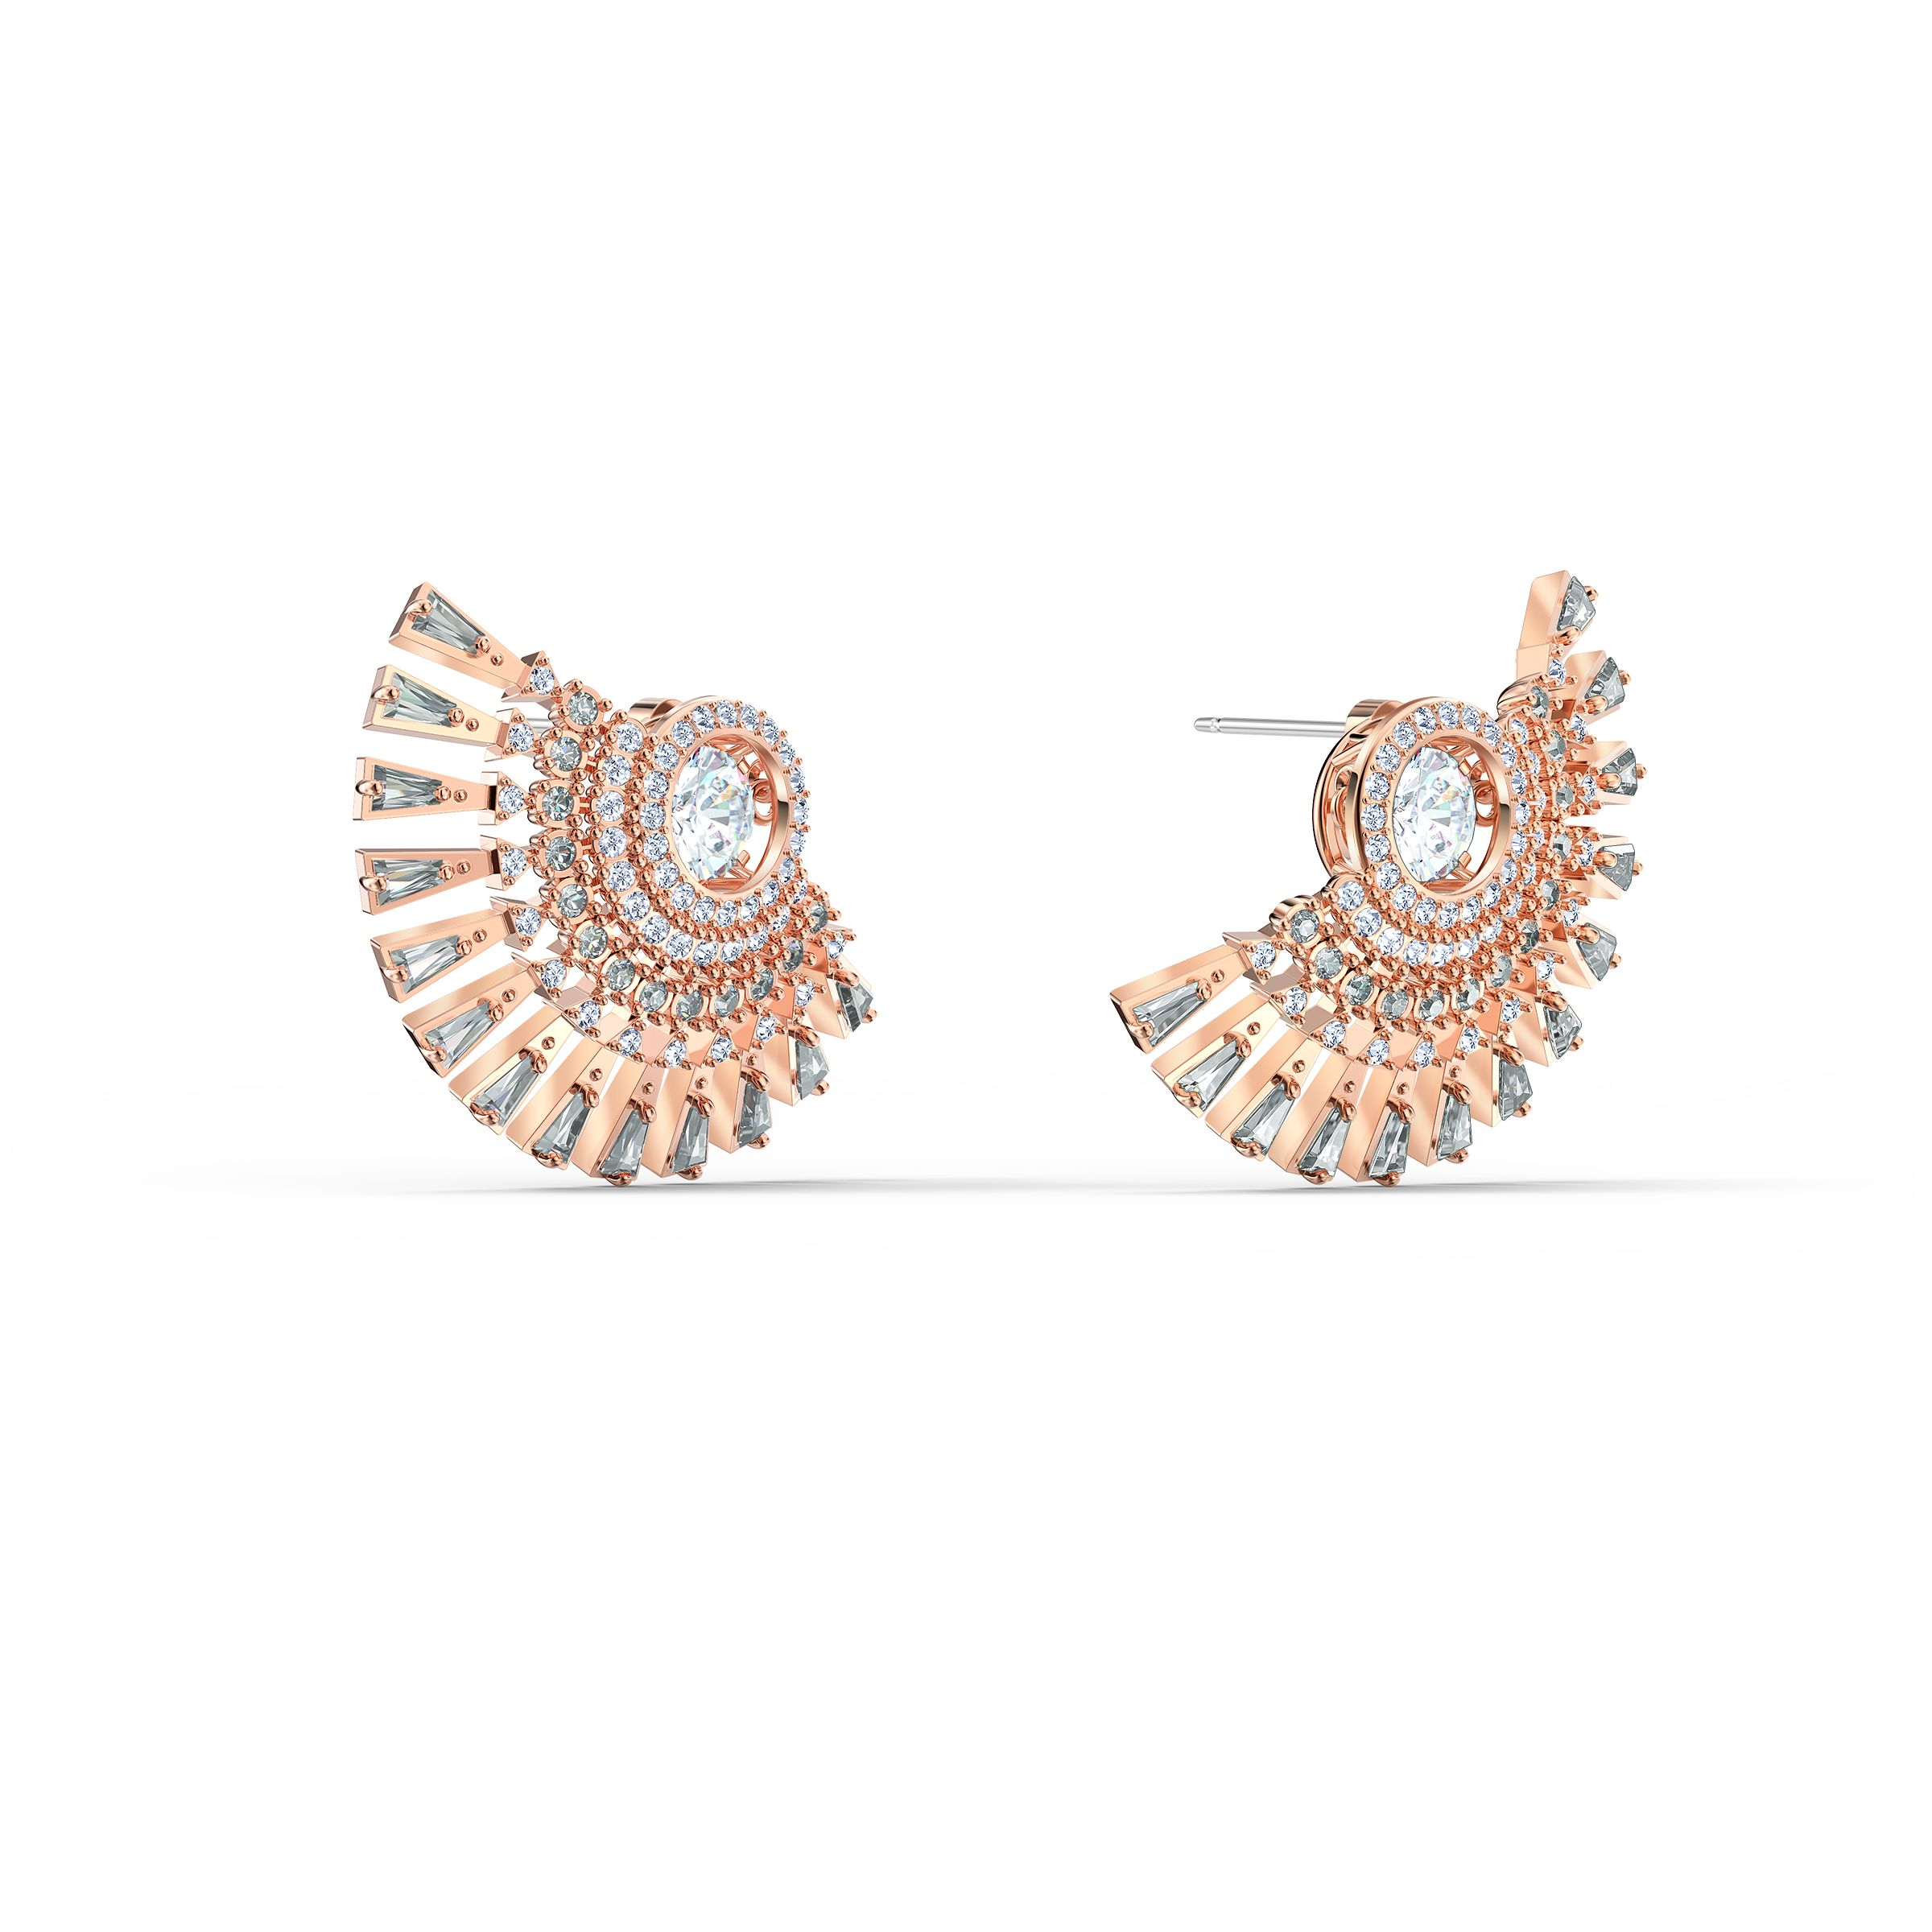 Boucles d'oreilles Swarovski Sparkling Dance Dial Up, gris, métal doré rose, Swarovski